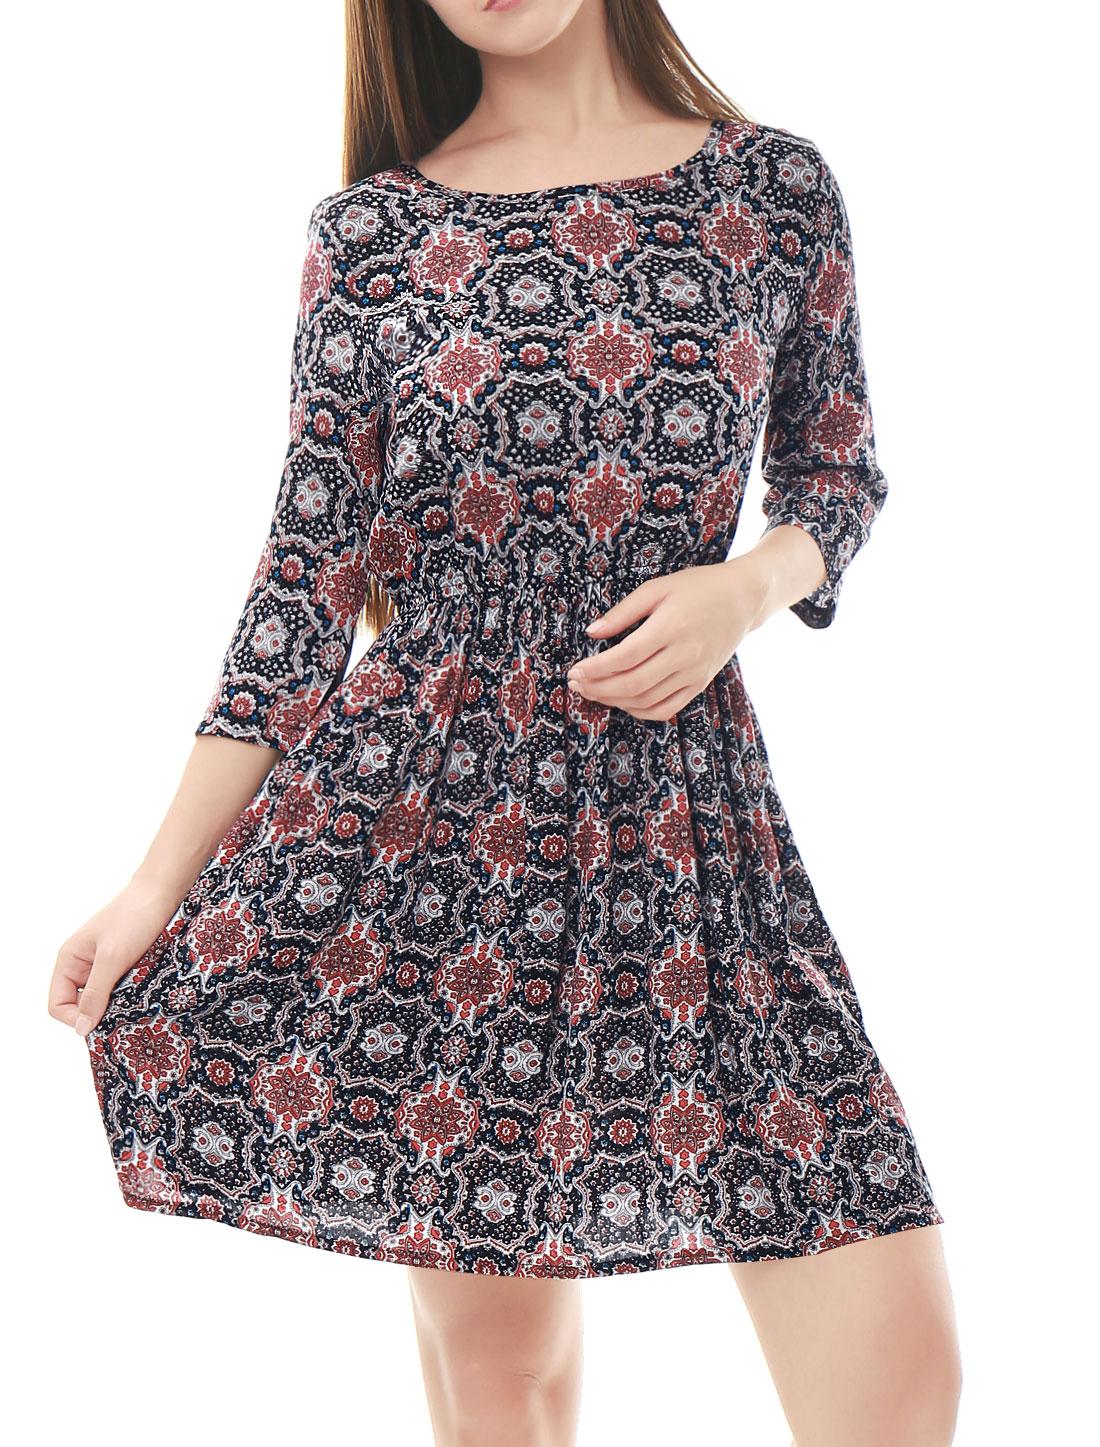 Woman Floral Prints 3/4 Sleeves Elastic Waist A Line Dress Black L